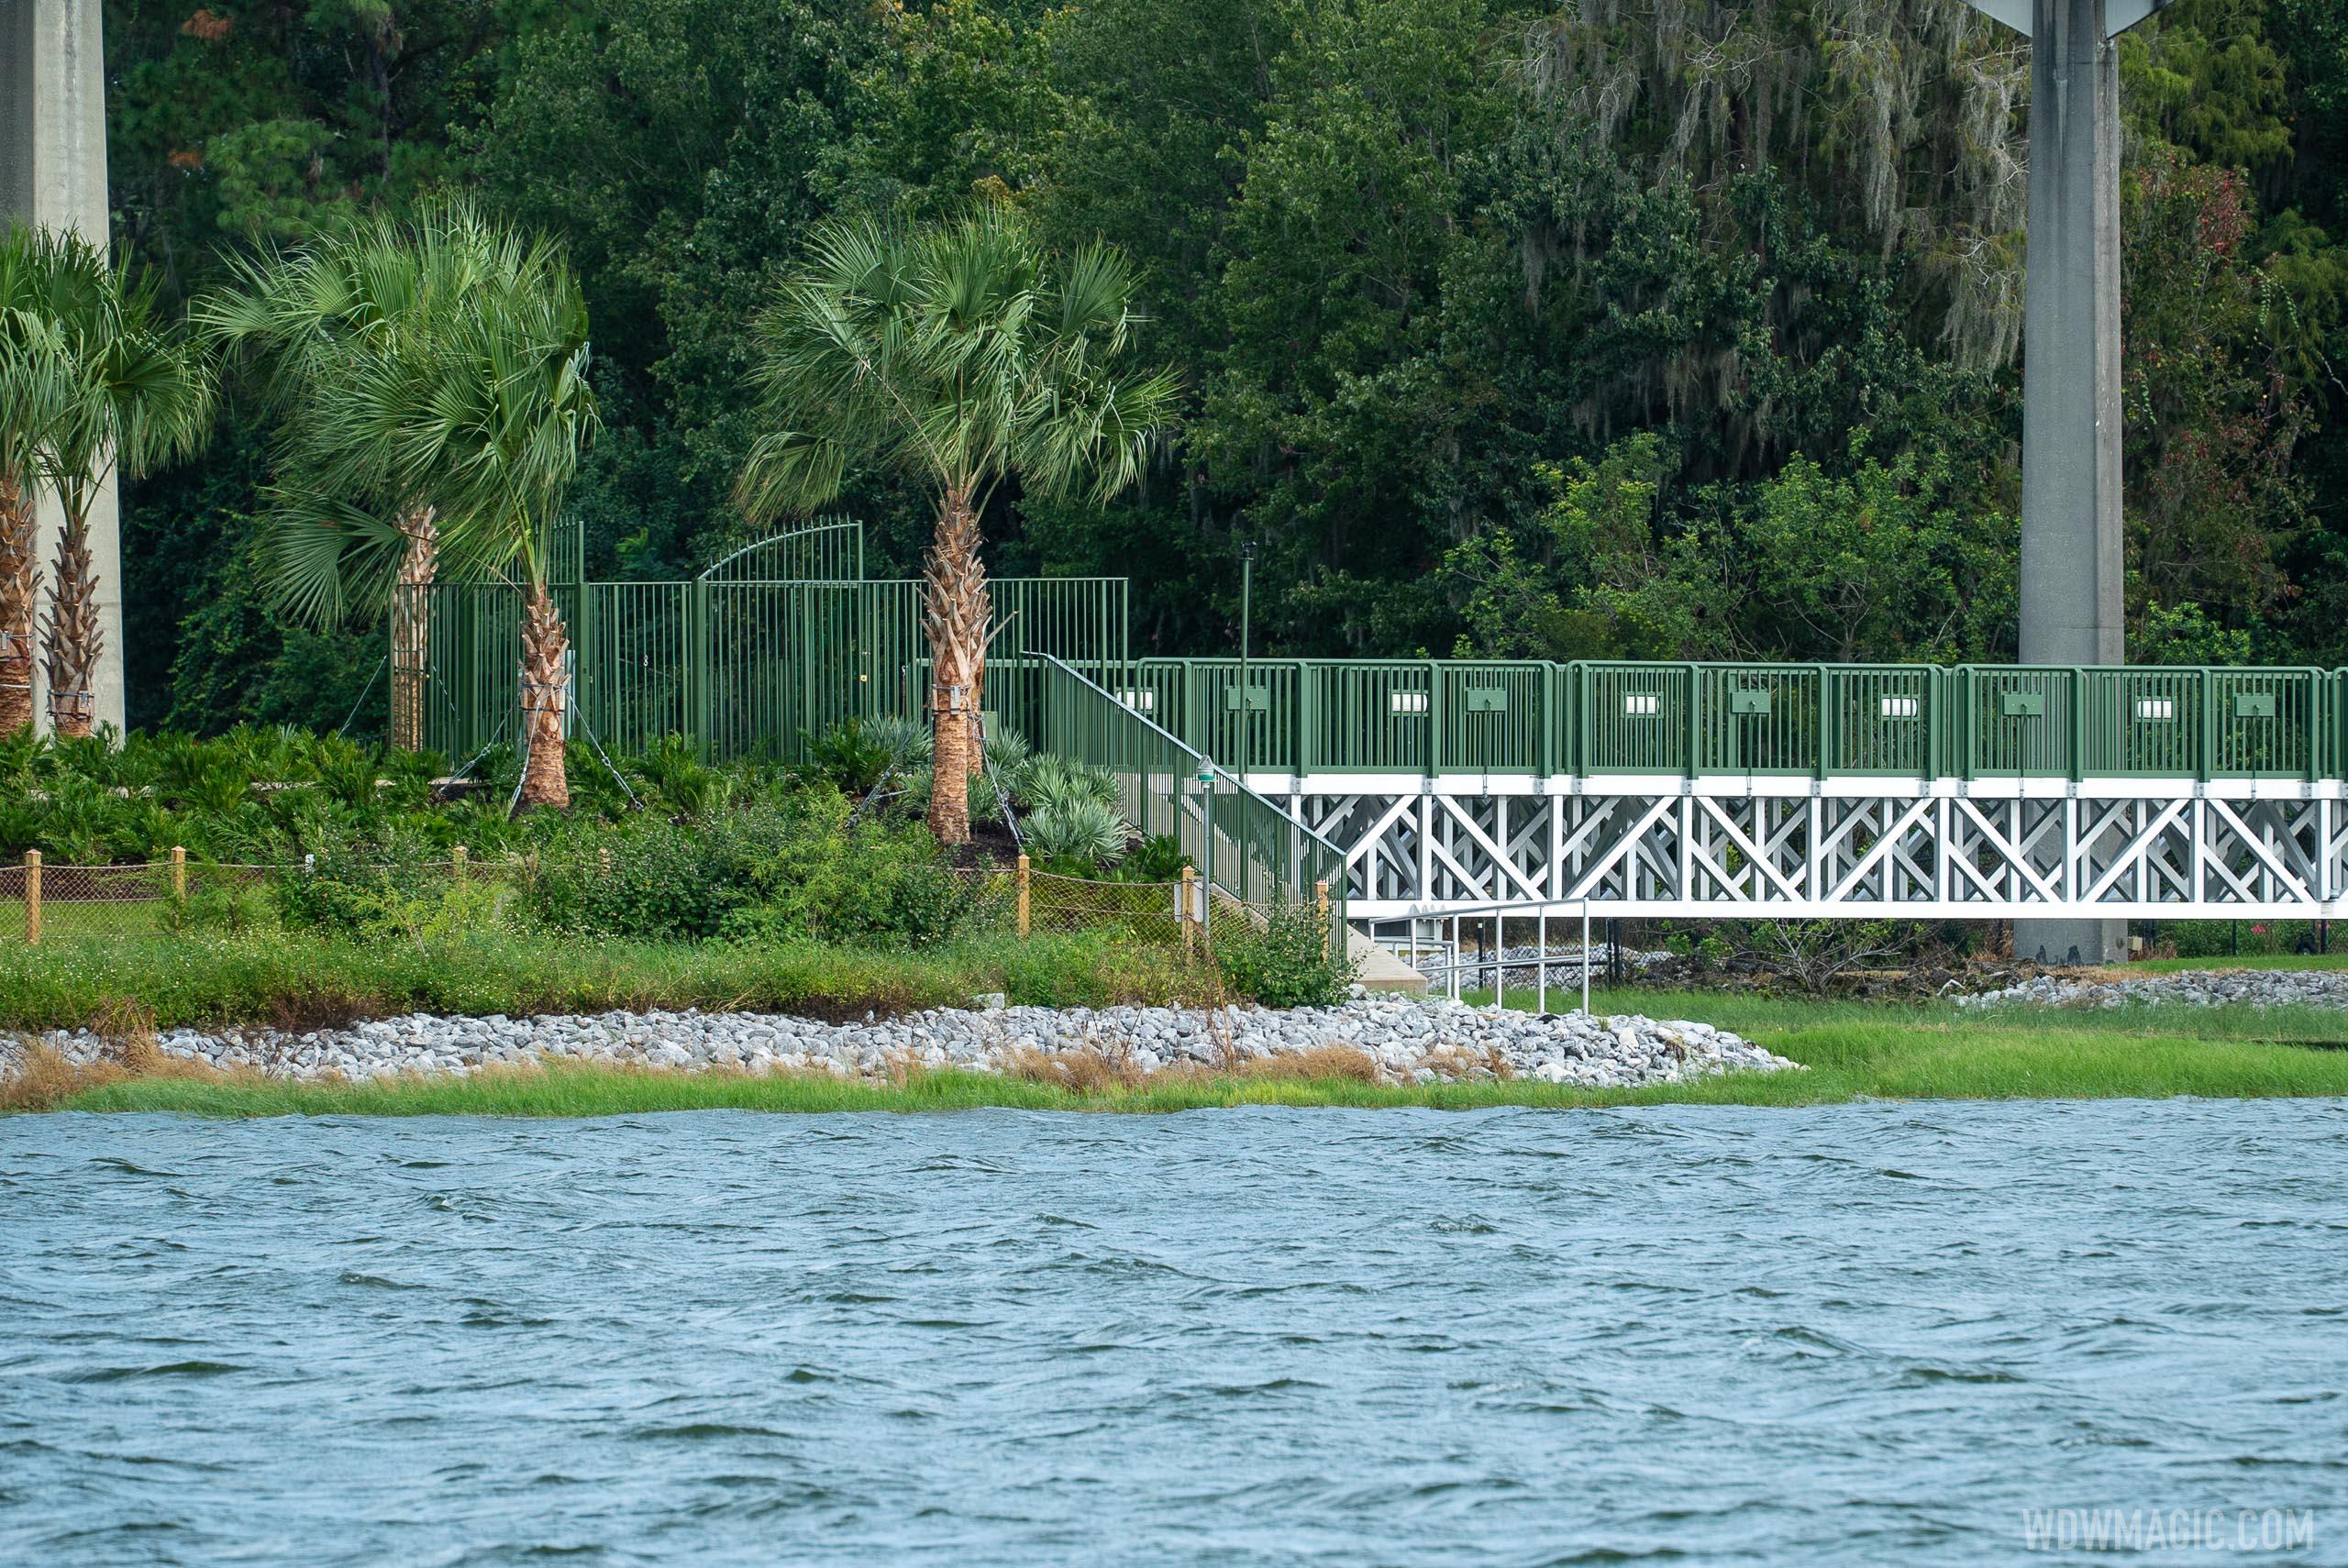 Grand Floridian to Magic Kingdom bridge construction - September 21 2020